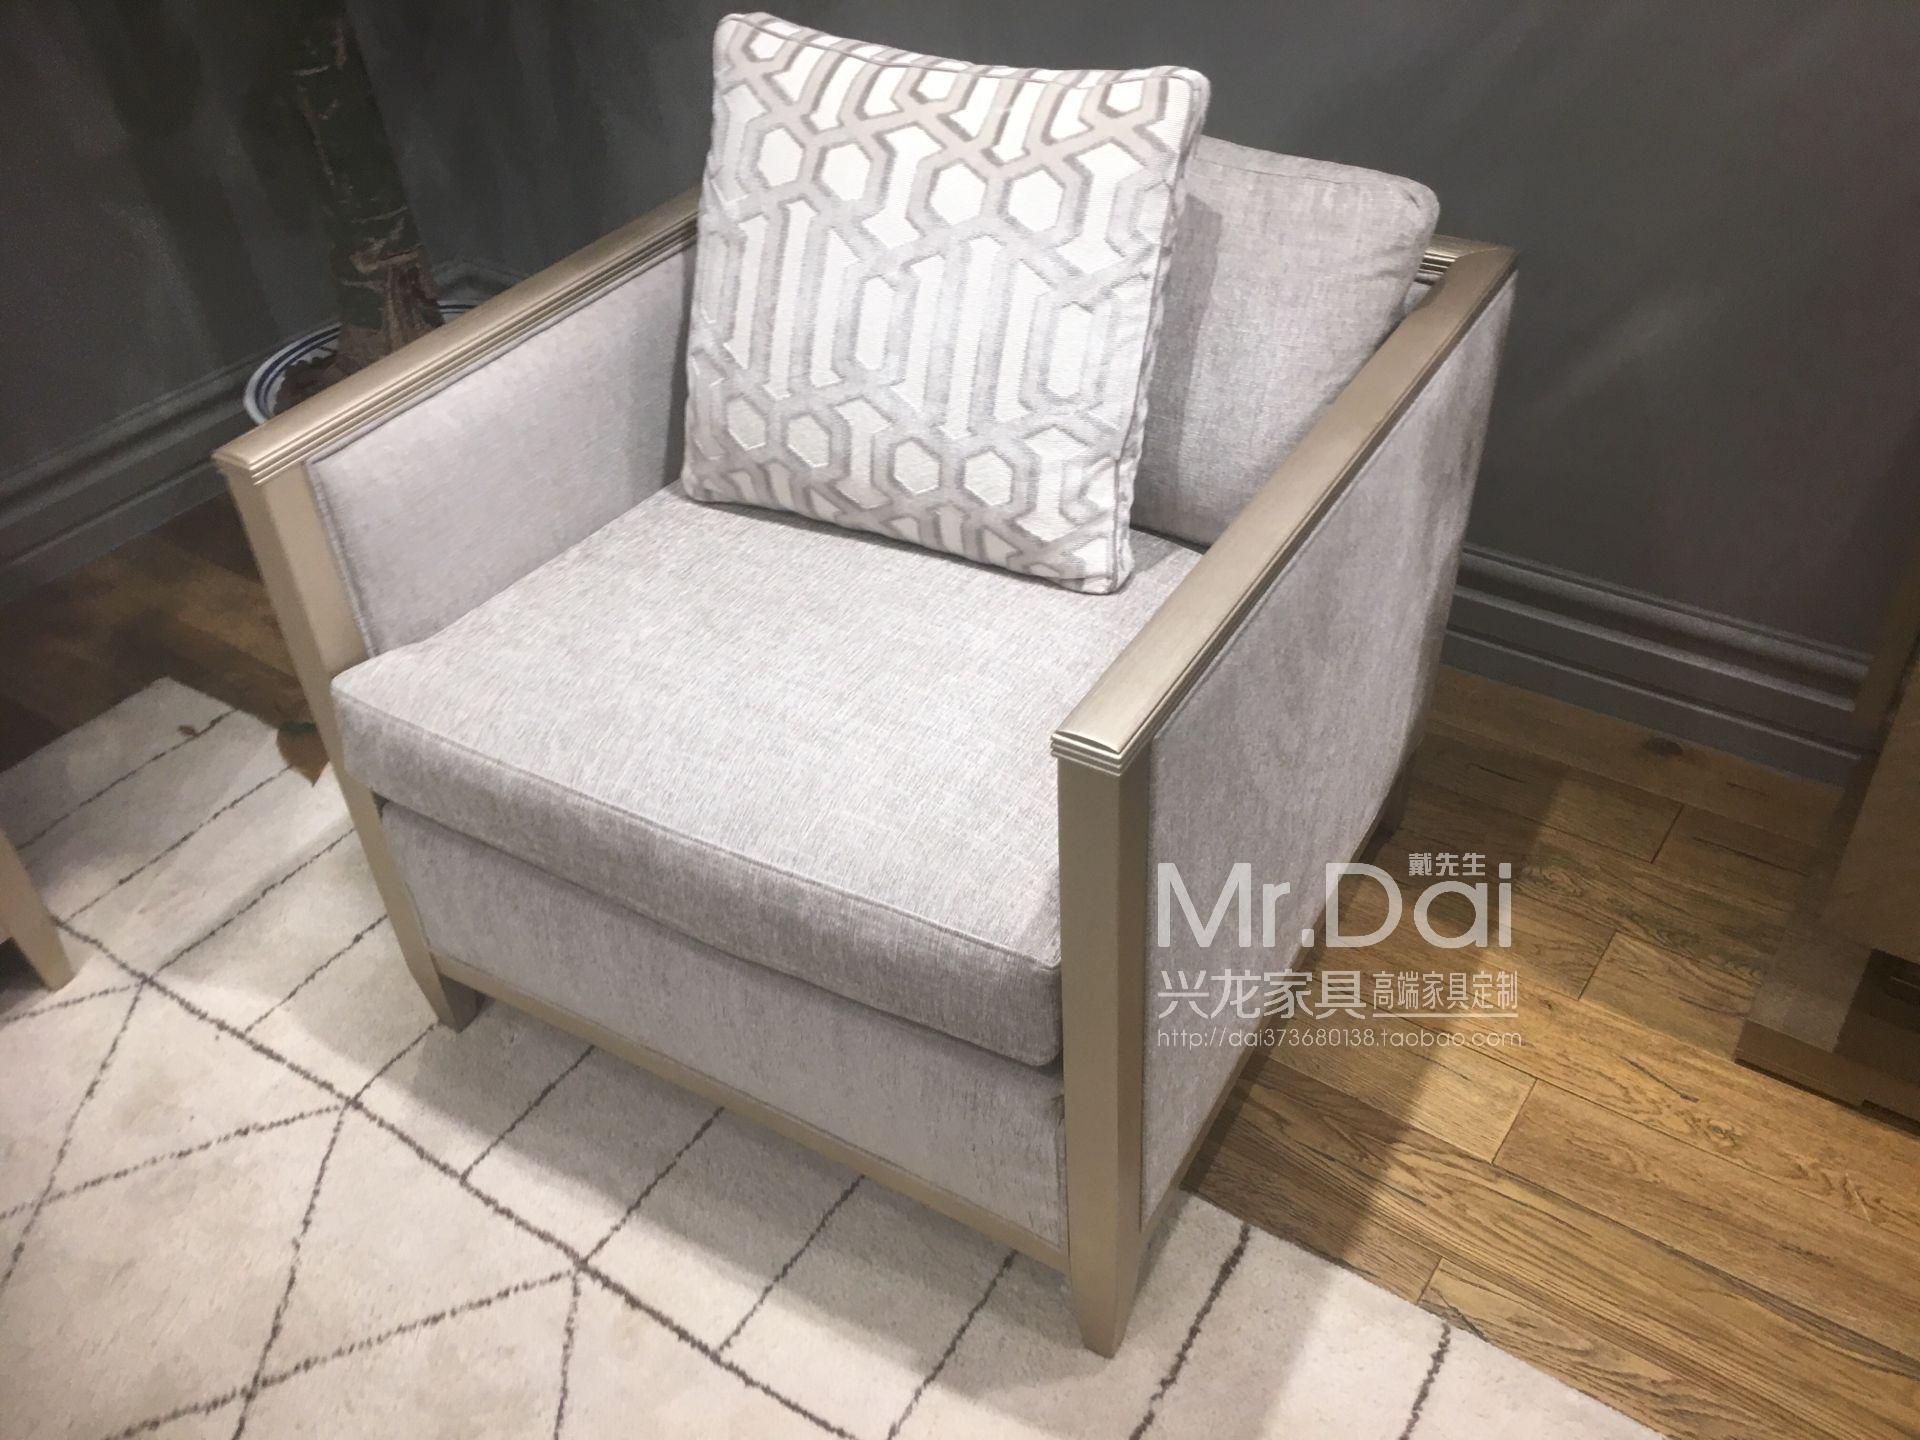 Уличная мебель / Скульптуры / Флагштоки Артикул 595054573172